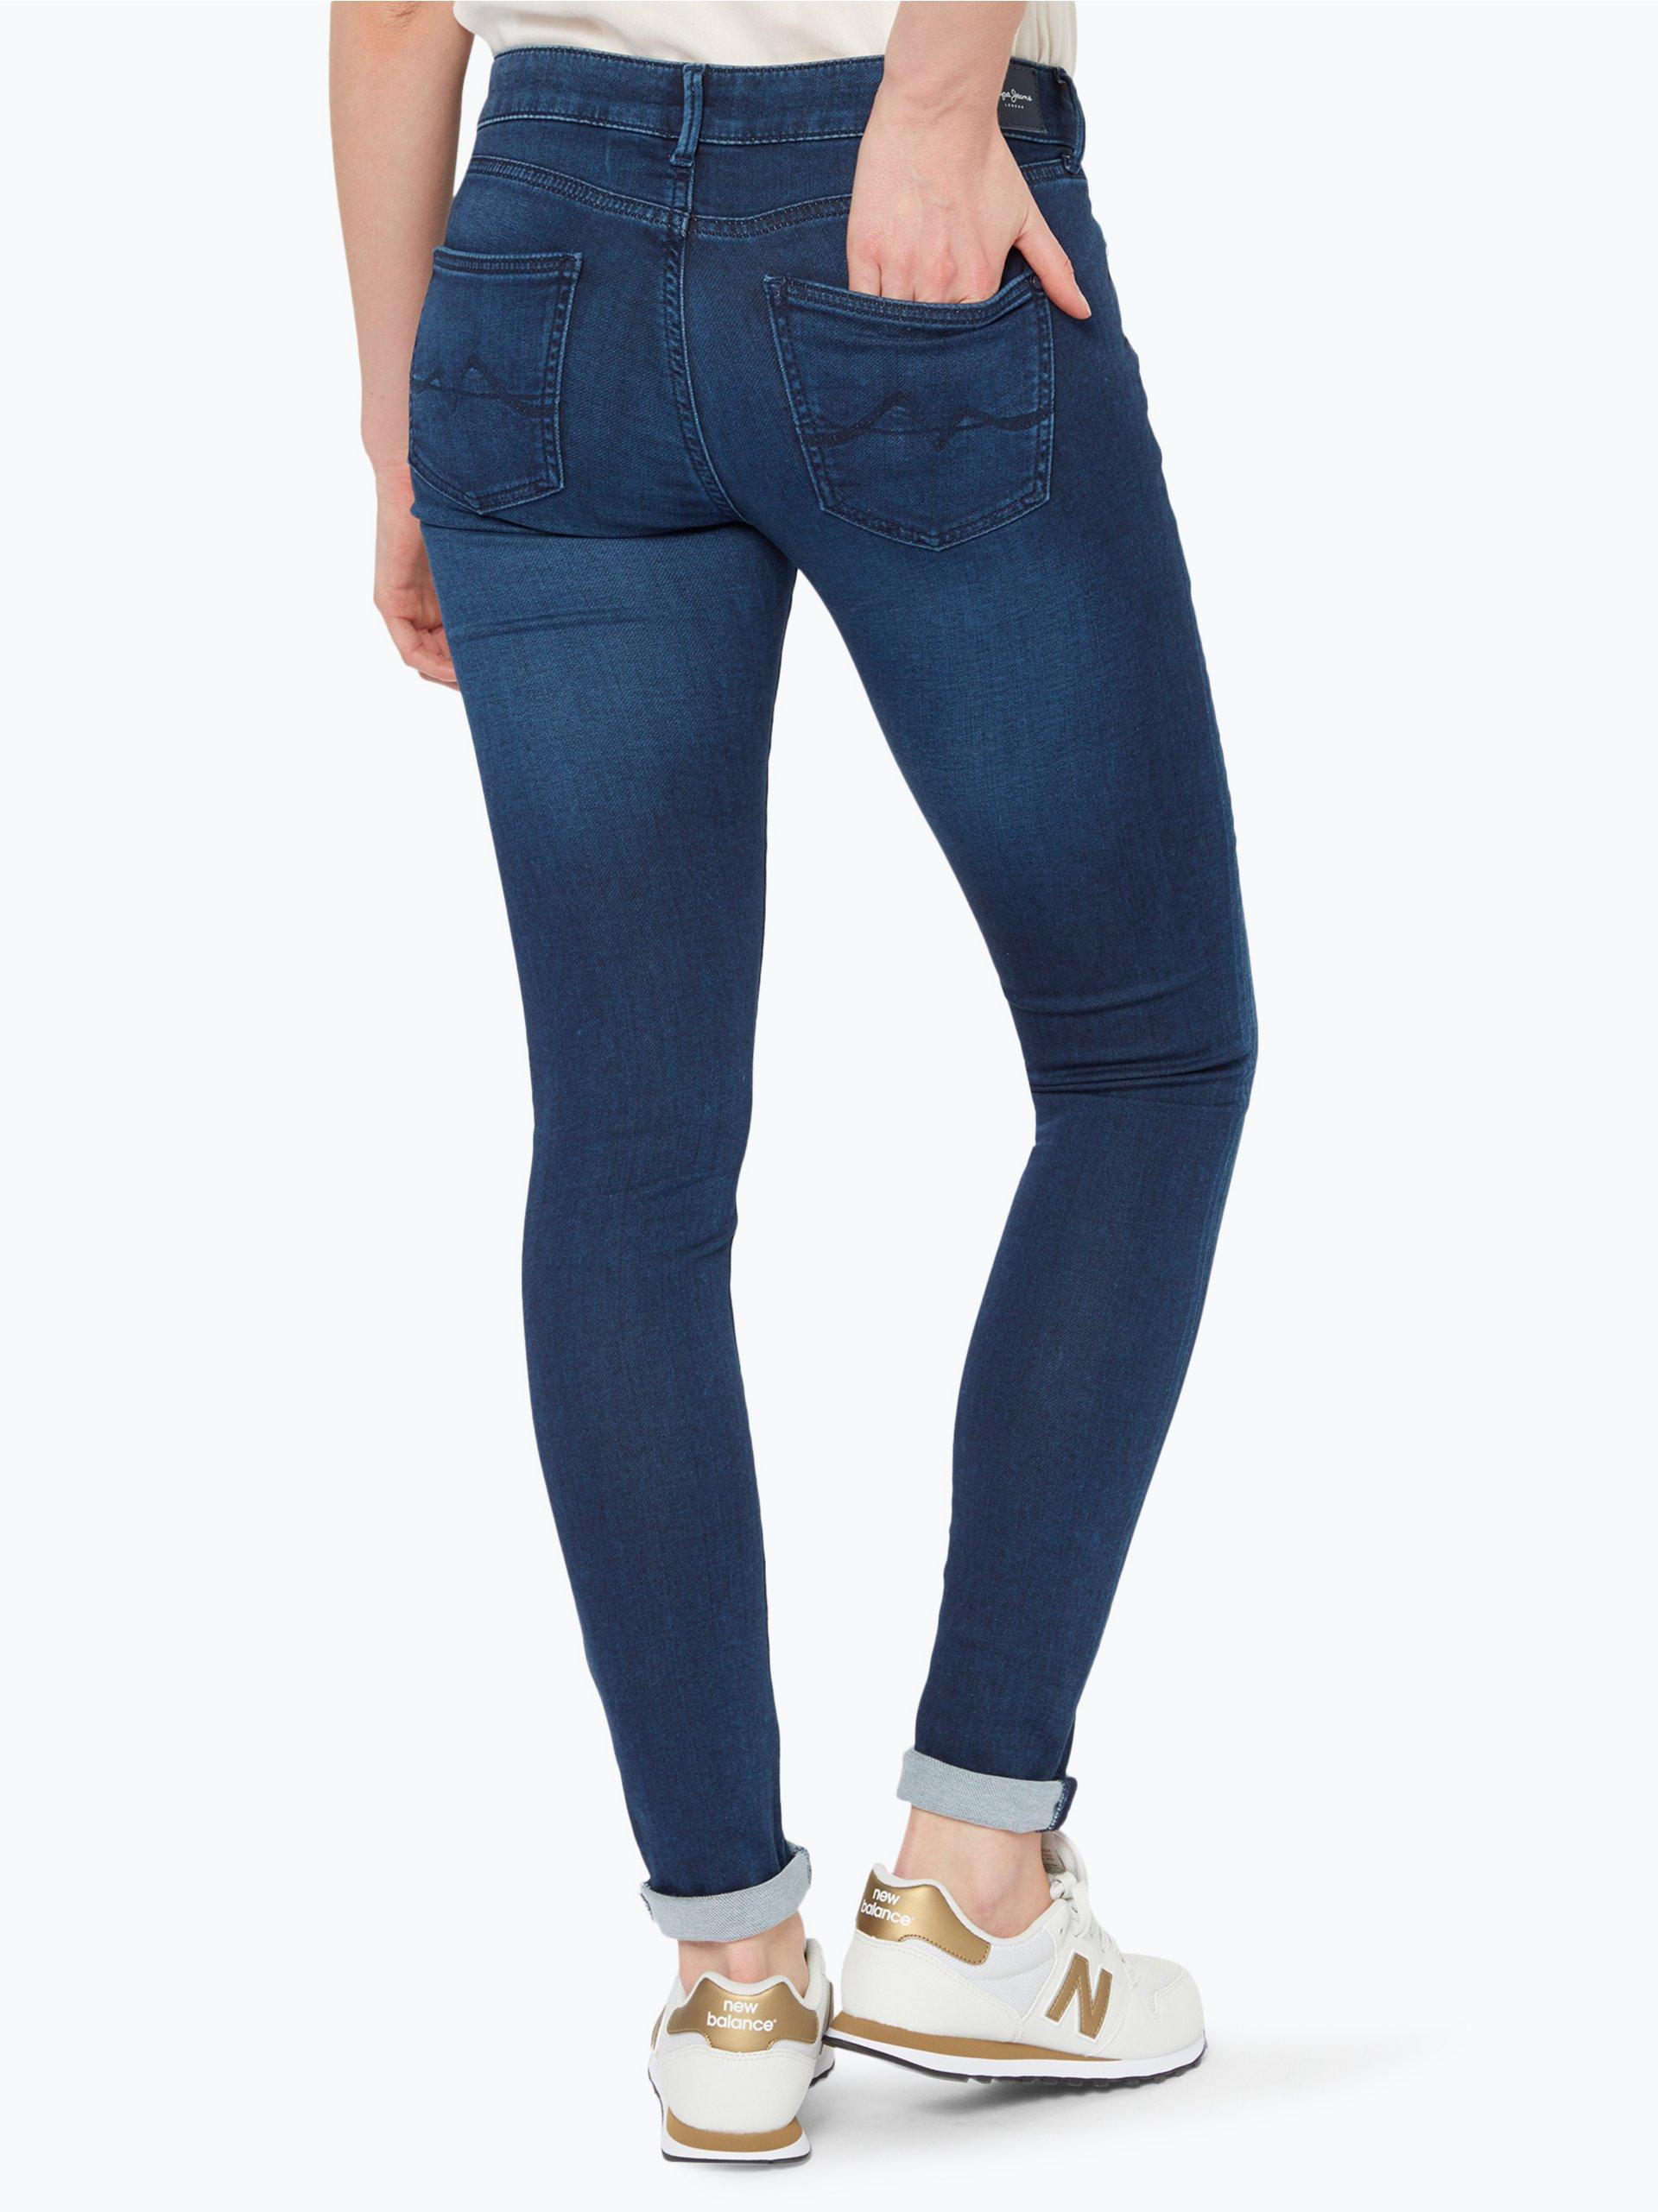 pepe jeans damen jeans pixie marine uni online kaufen peek und cloppenburg de. Black Bedroom Furniture Sets. Home Design Ideas